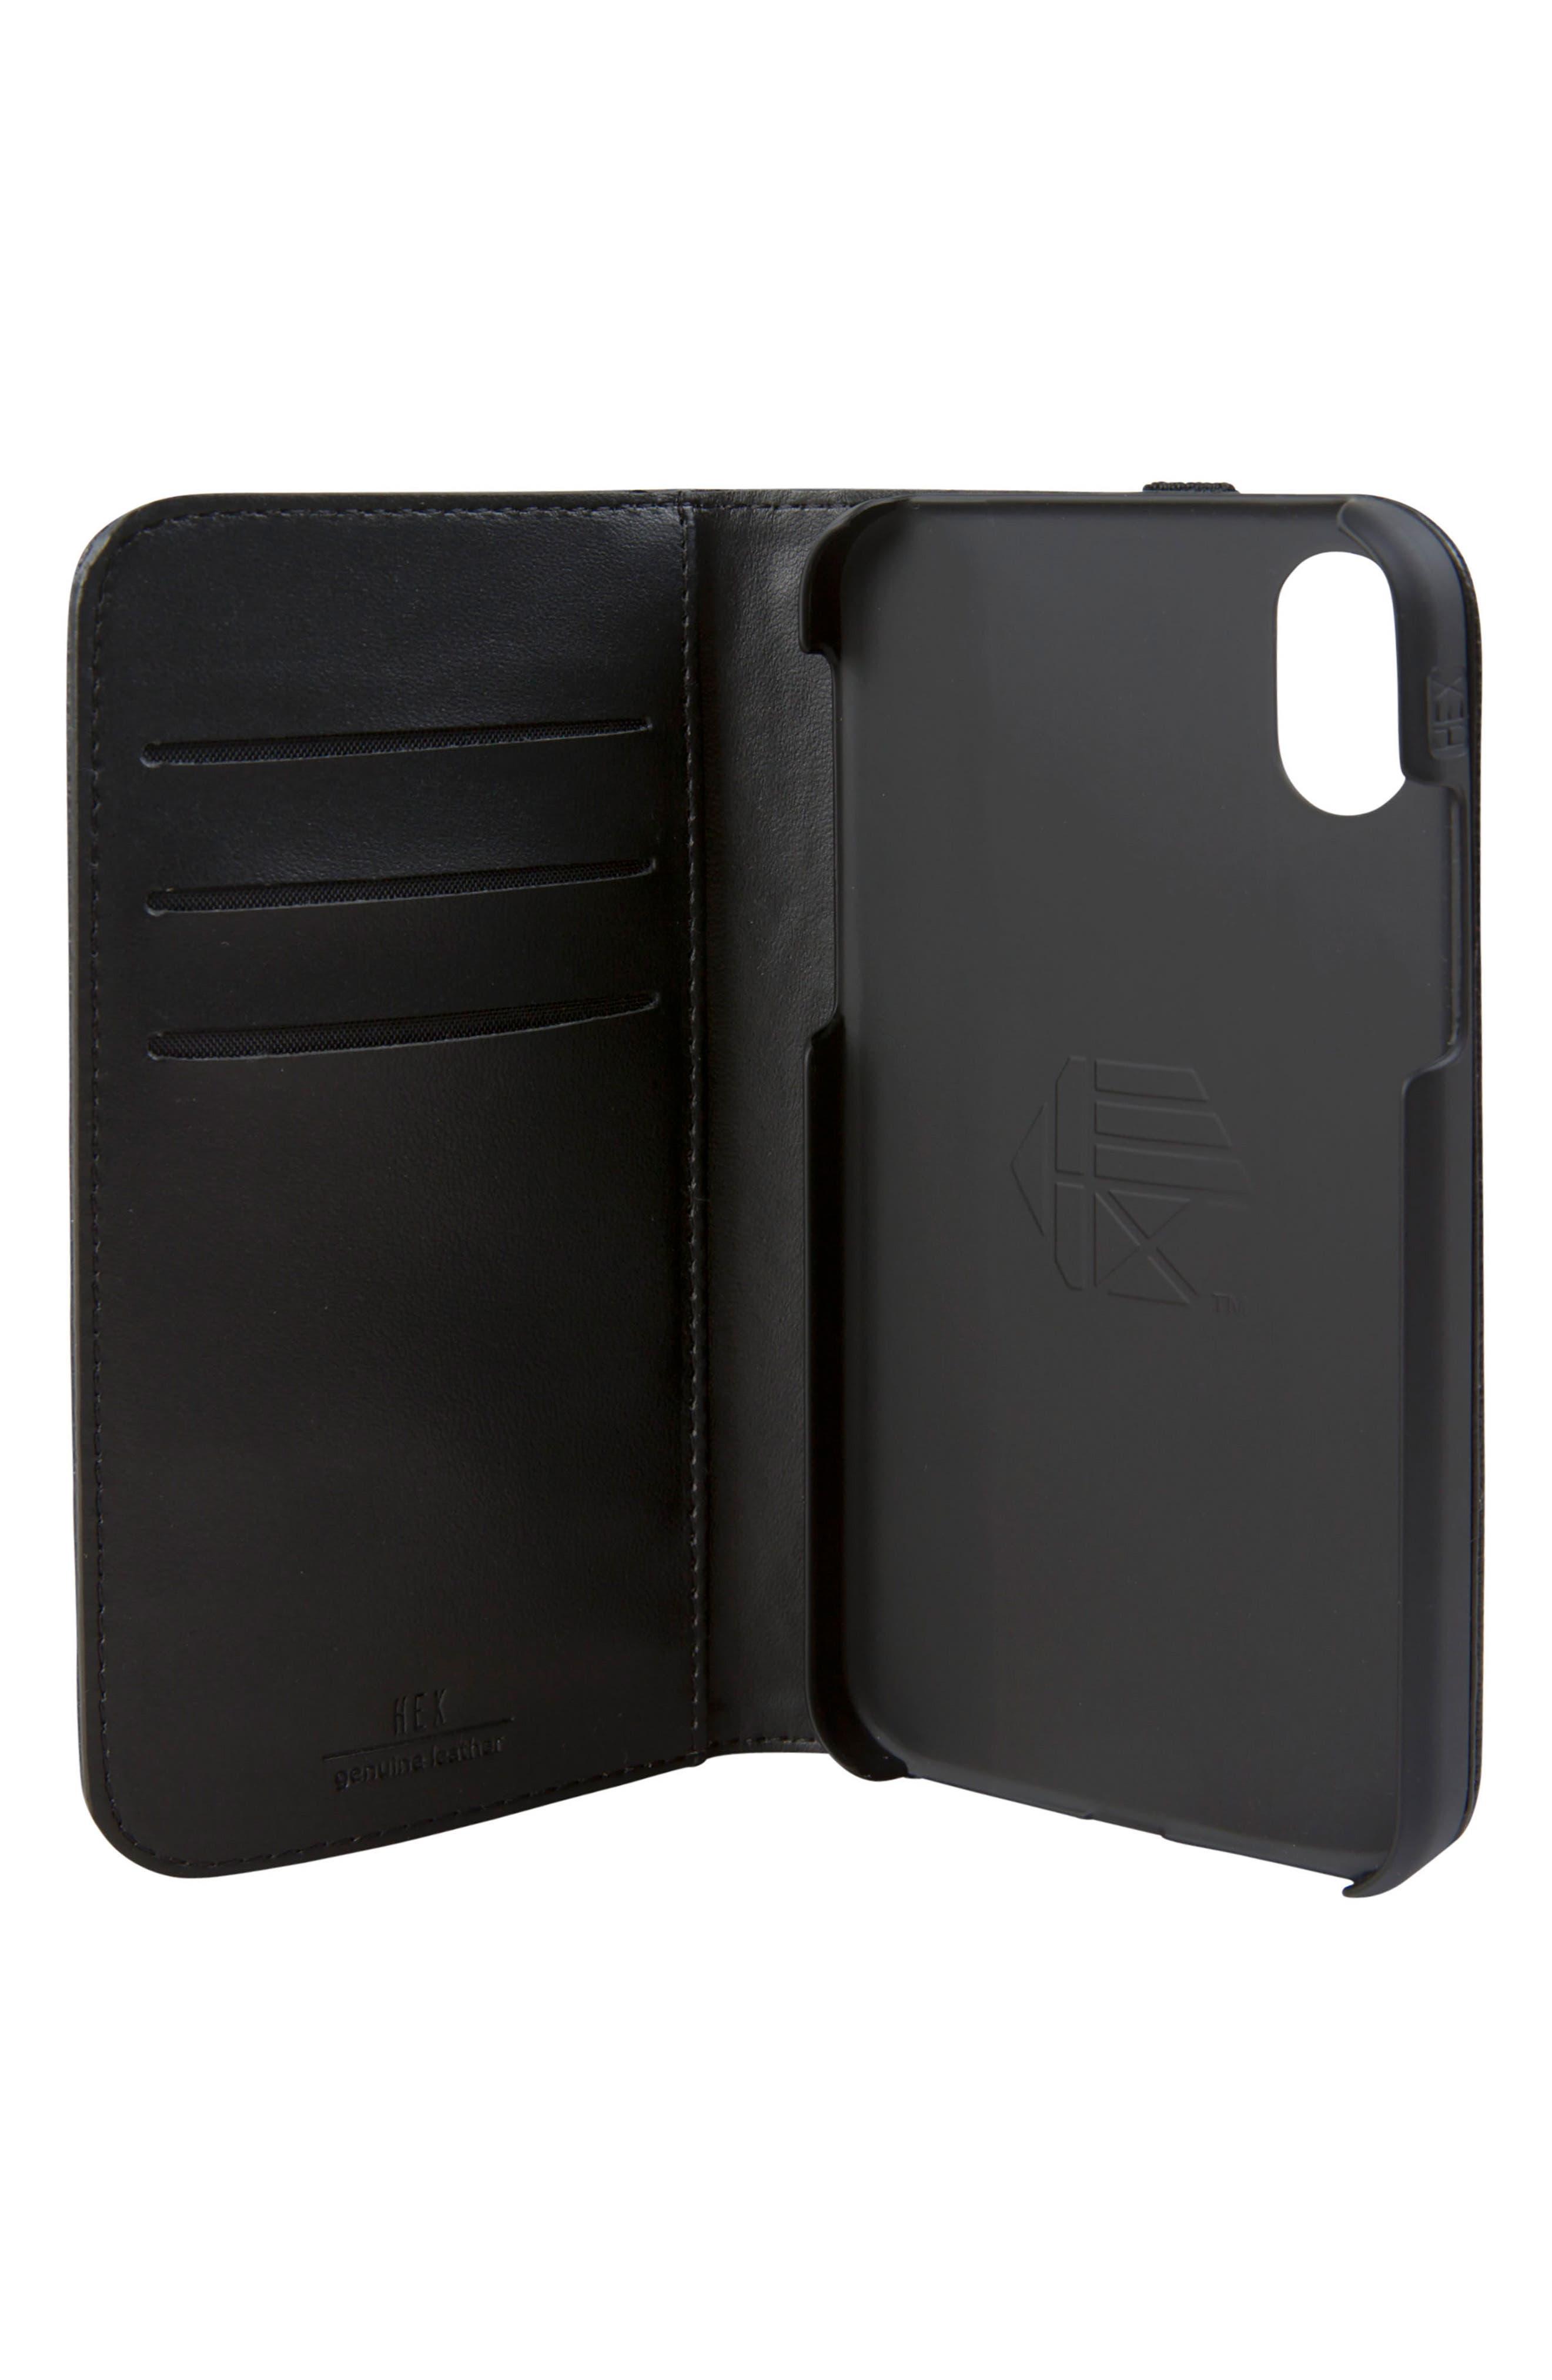 Icon iPhone X Wallet Case,                             Alternate thumbnail 2, color,                             Black/ Gold